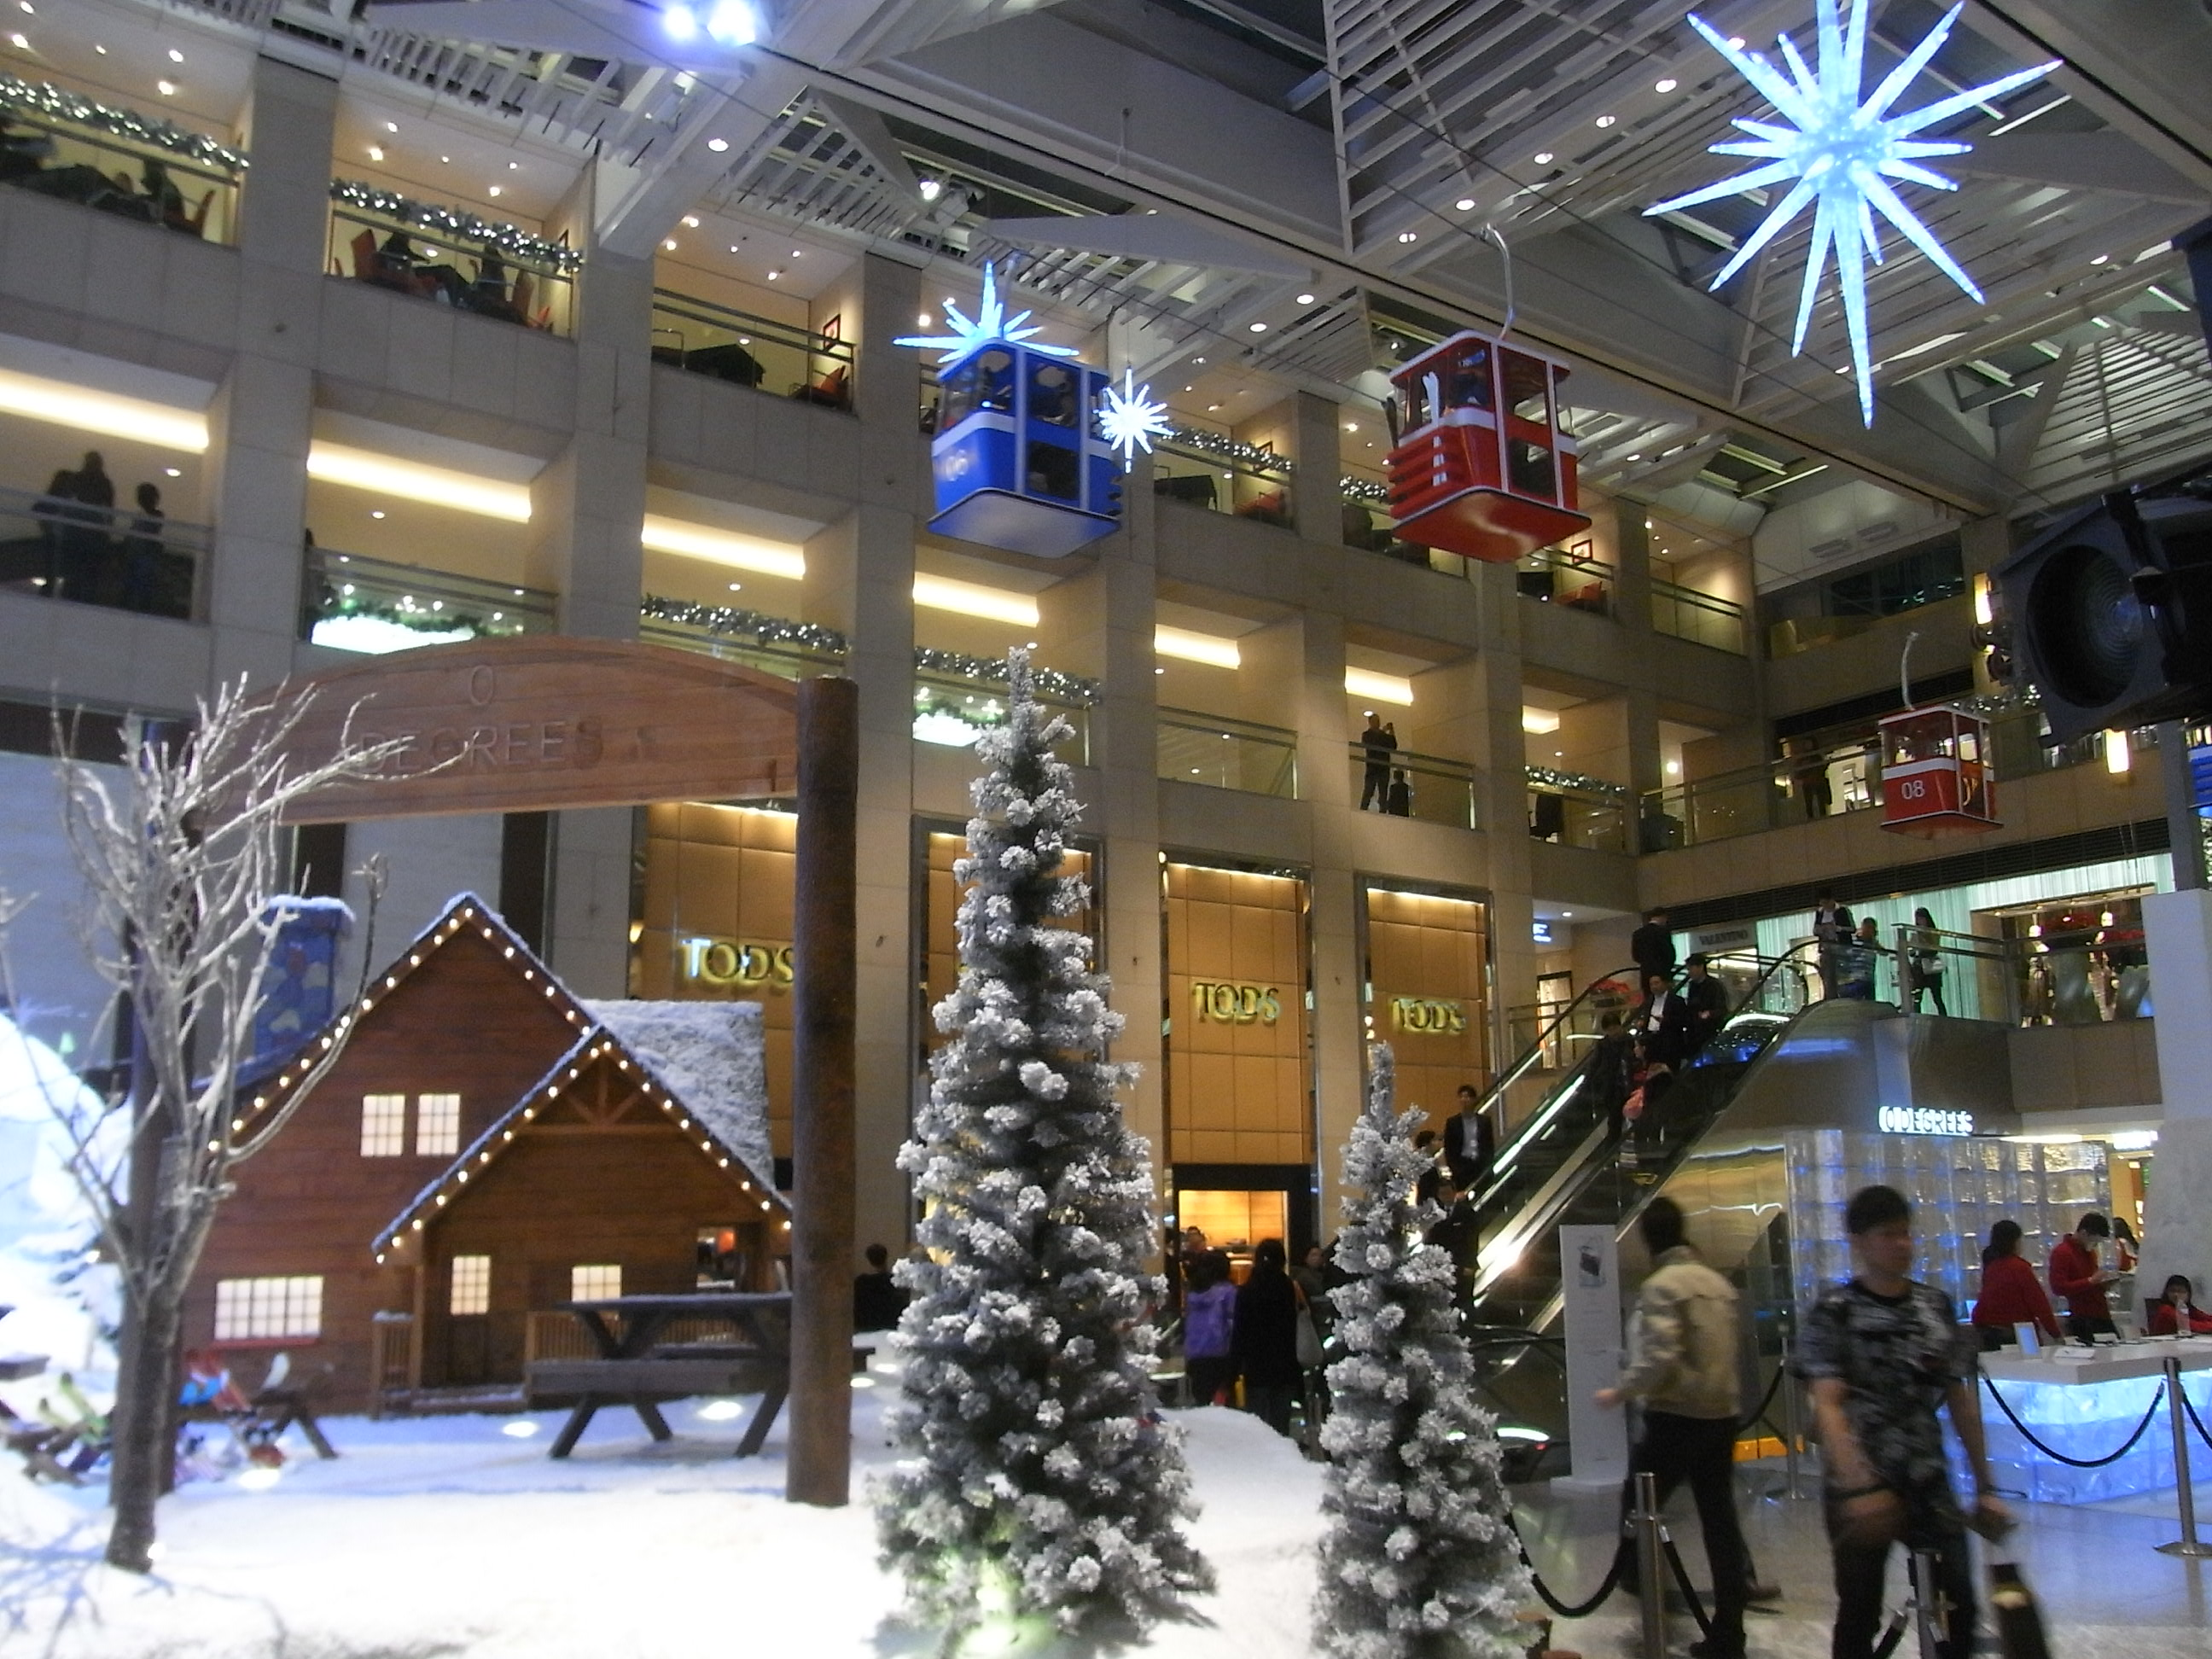 #2B65A0 File:HK Central Landmark Mall Interior Evening 09  6411 décoration noel fabriquer cm1 2592x1944 px @ aertt.com